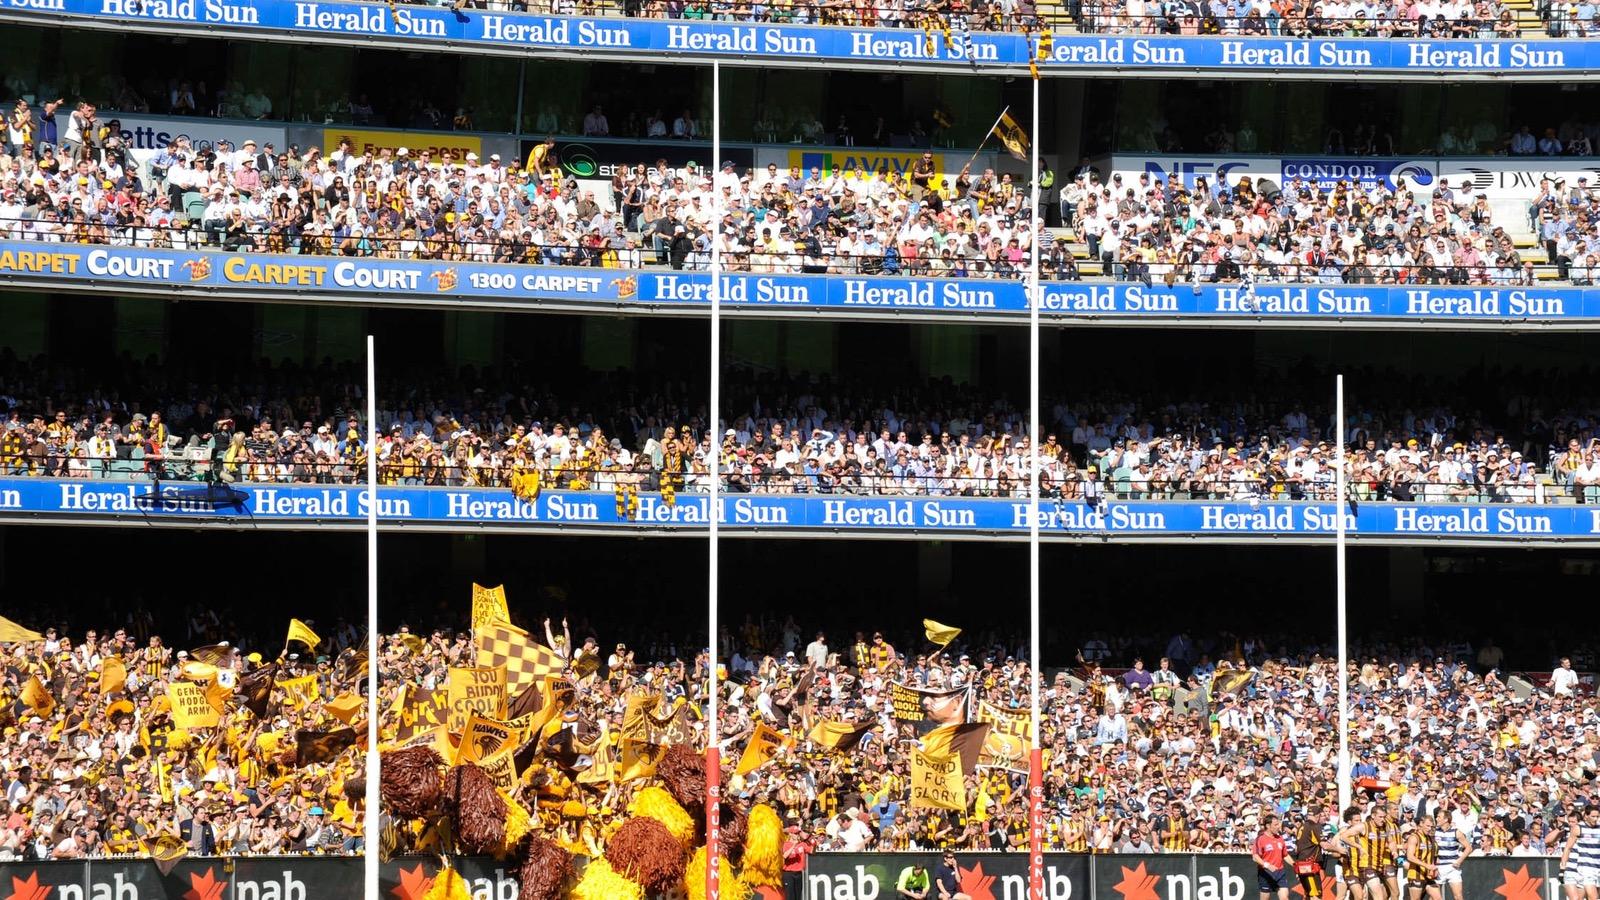 Melbourne Cricket Ground Aussie Rules Football Hawks fans